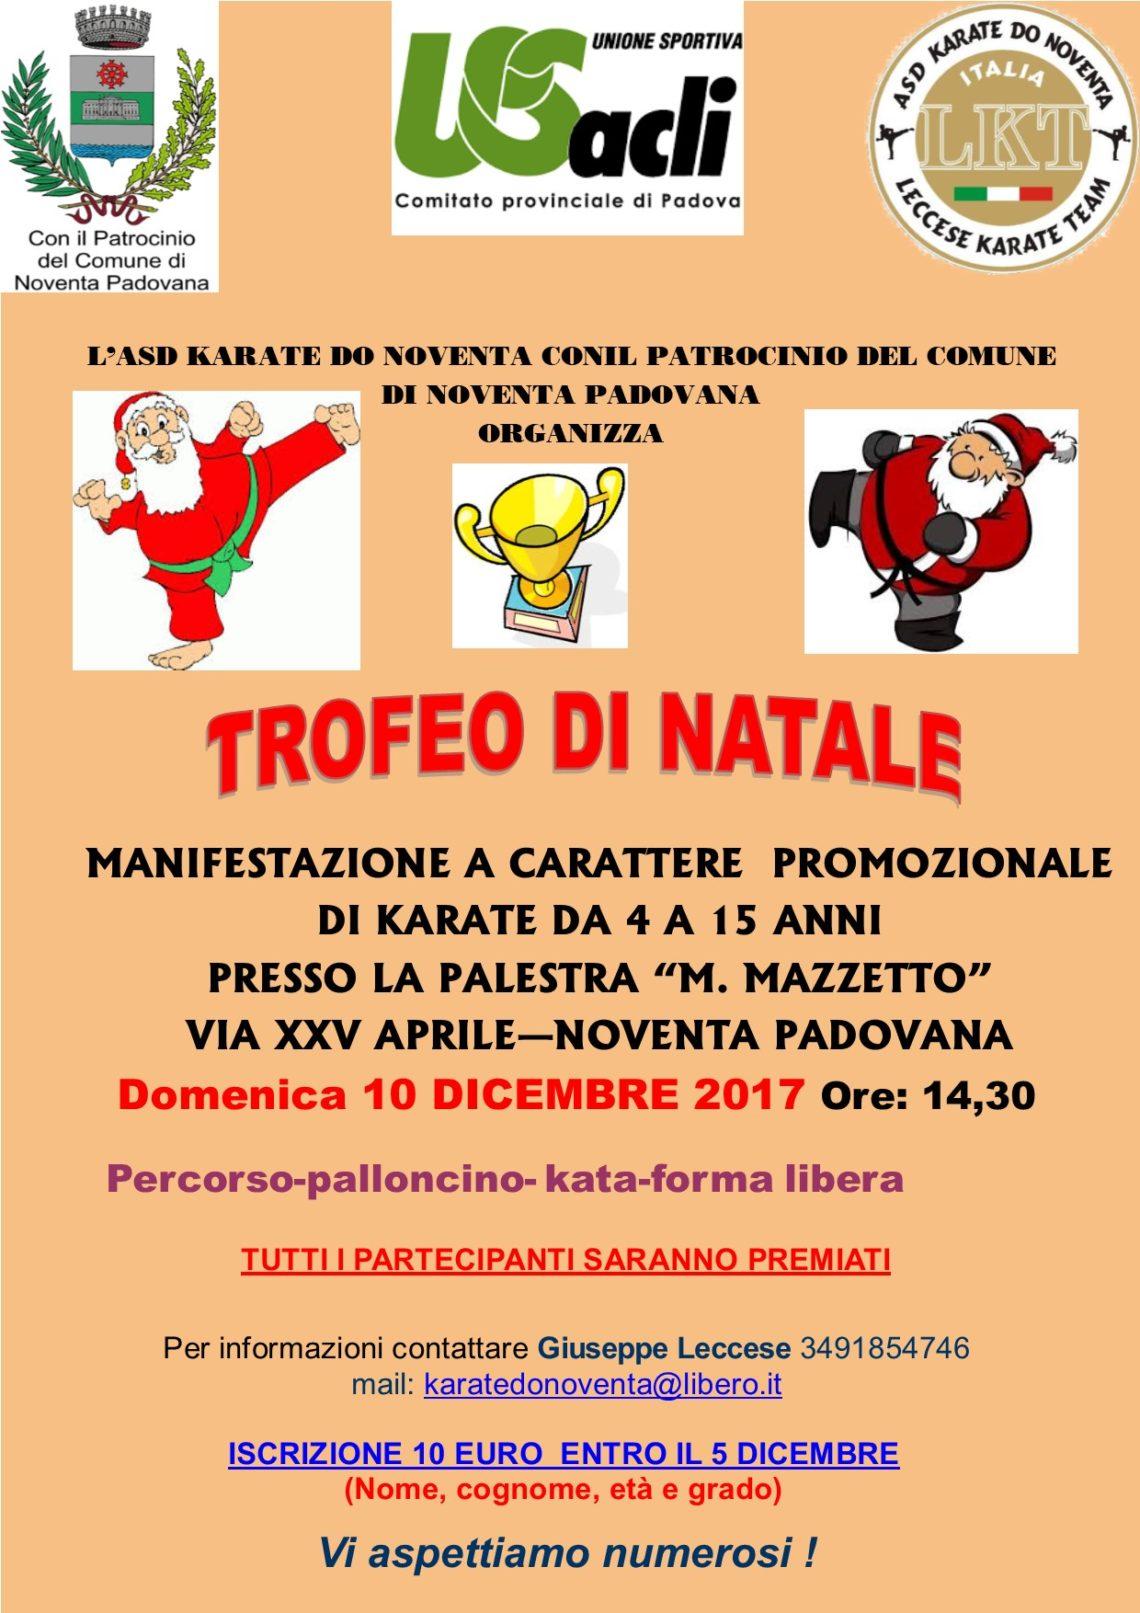 Immagini Karate Natale.Trofeo Di Natale Di Karate Domenica 10 Dicembre Us Acli